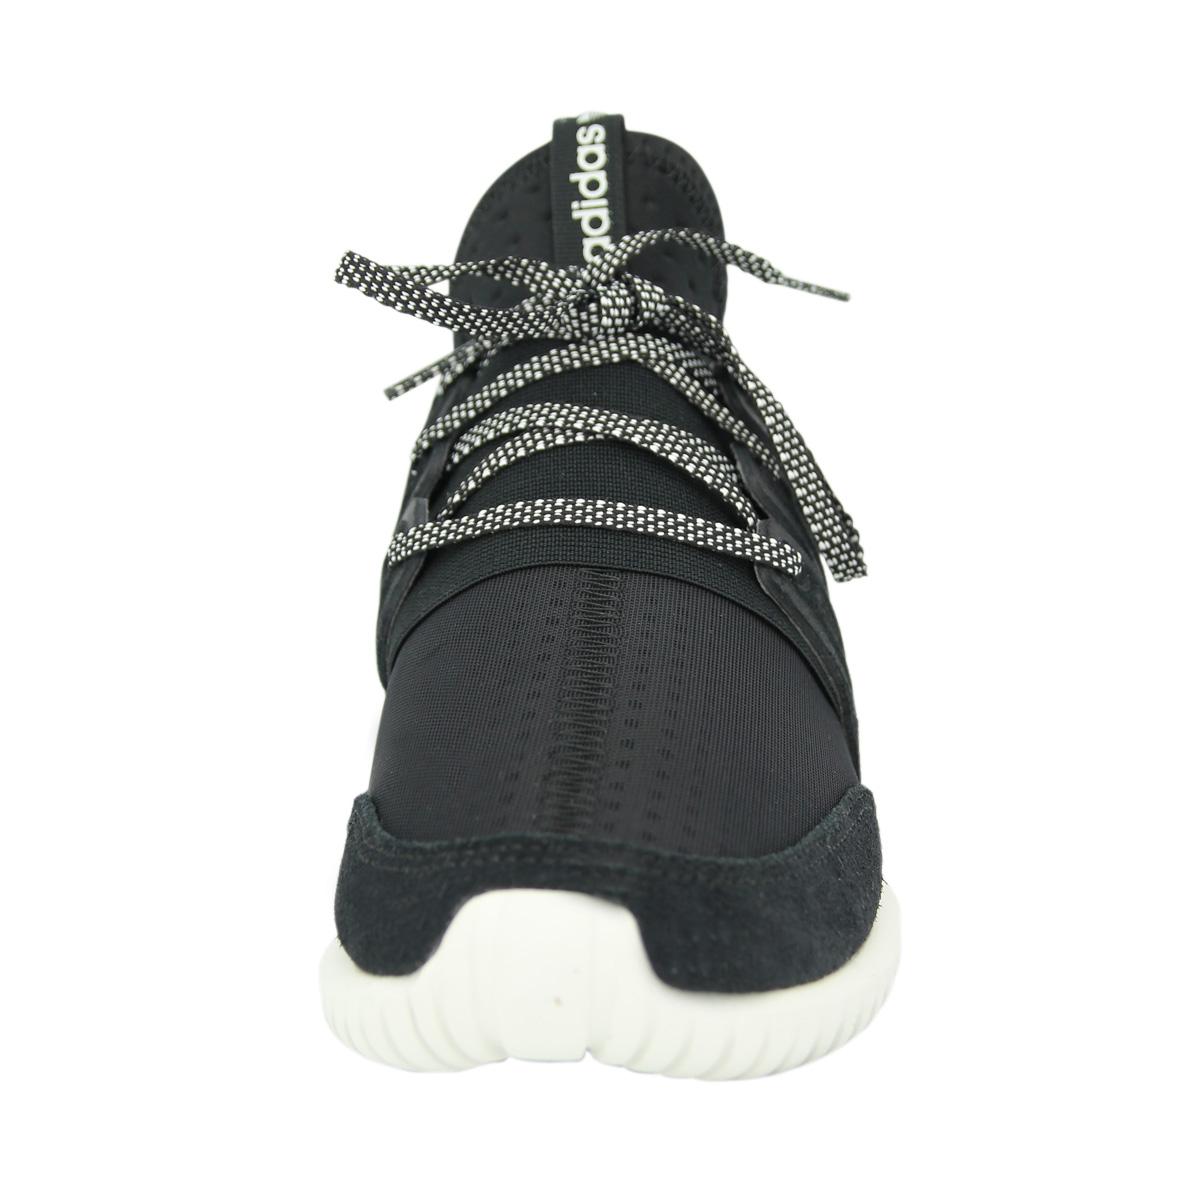 Descuento Adidas Originals tubular radial negro unisex unisex unisex Zapatillas zapatos nuevo b23ed5